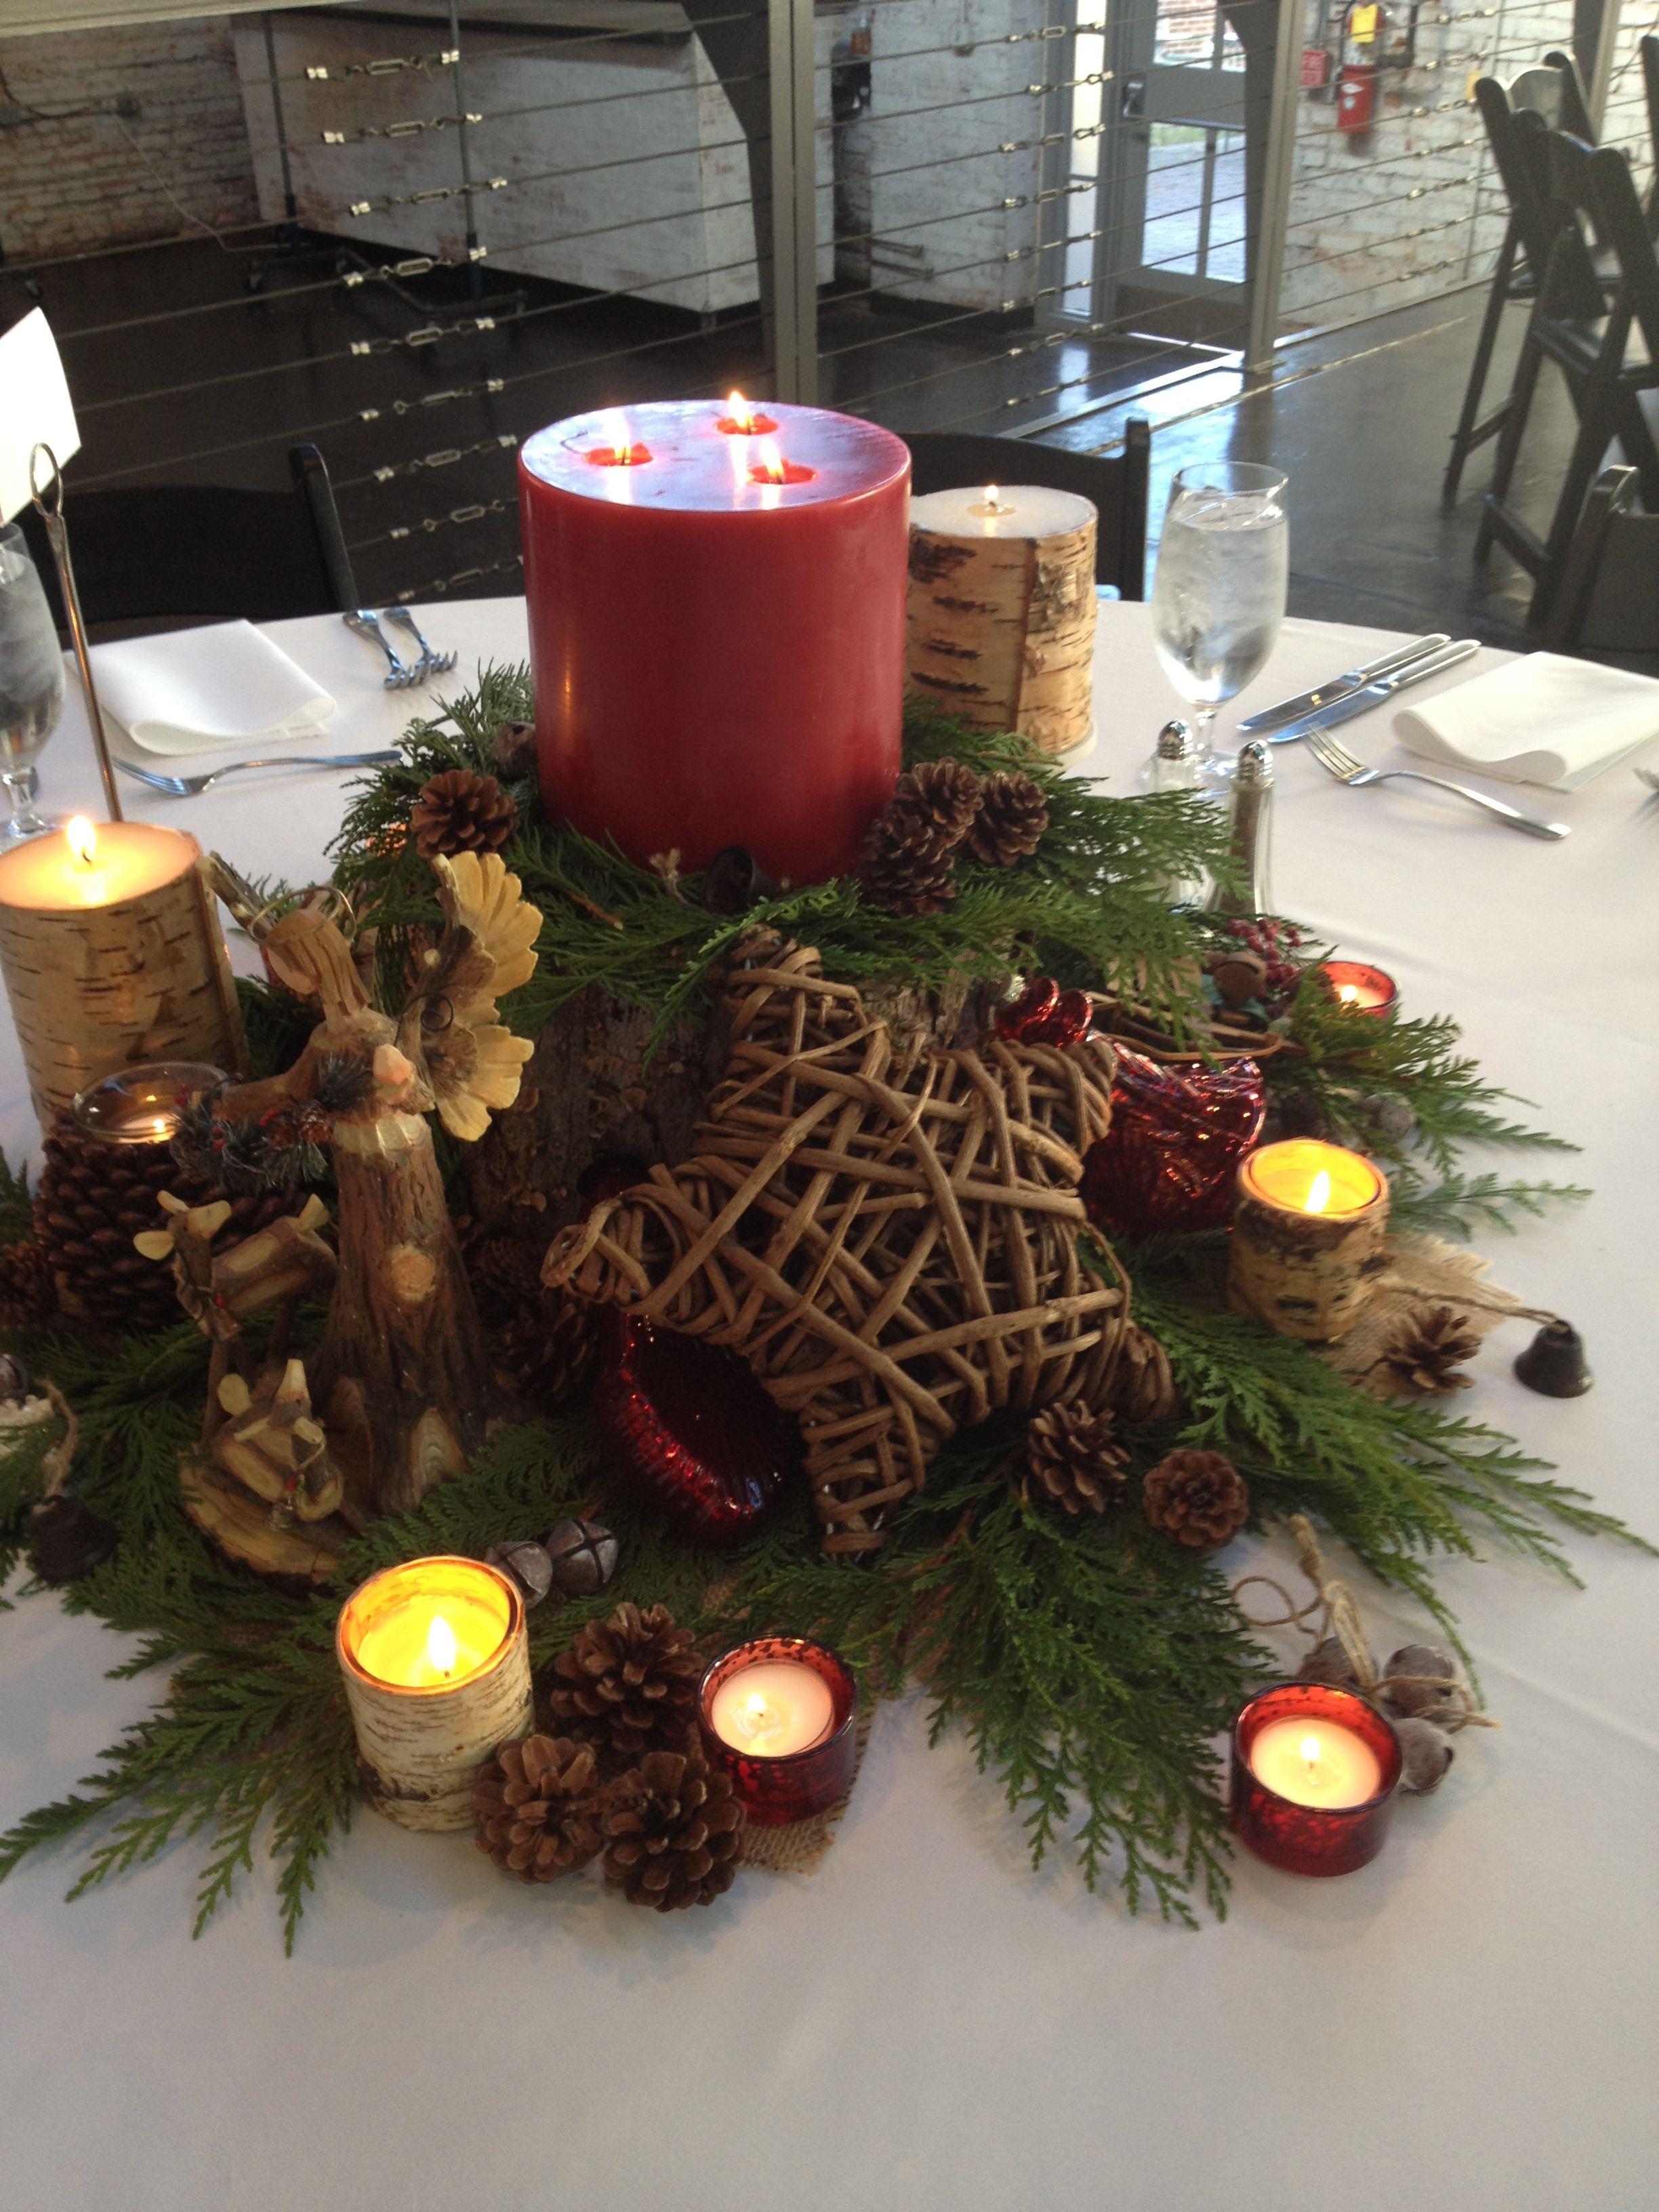 Rustic Christmas Table Centerpiece Christmas Table Centerpieces Christmas Table Table Centerpieces